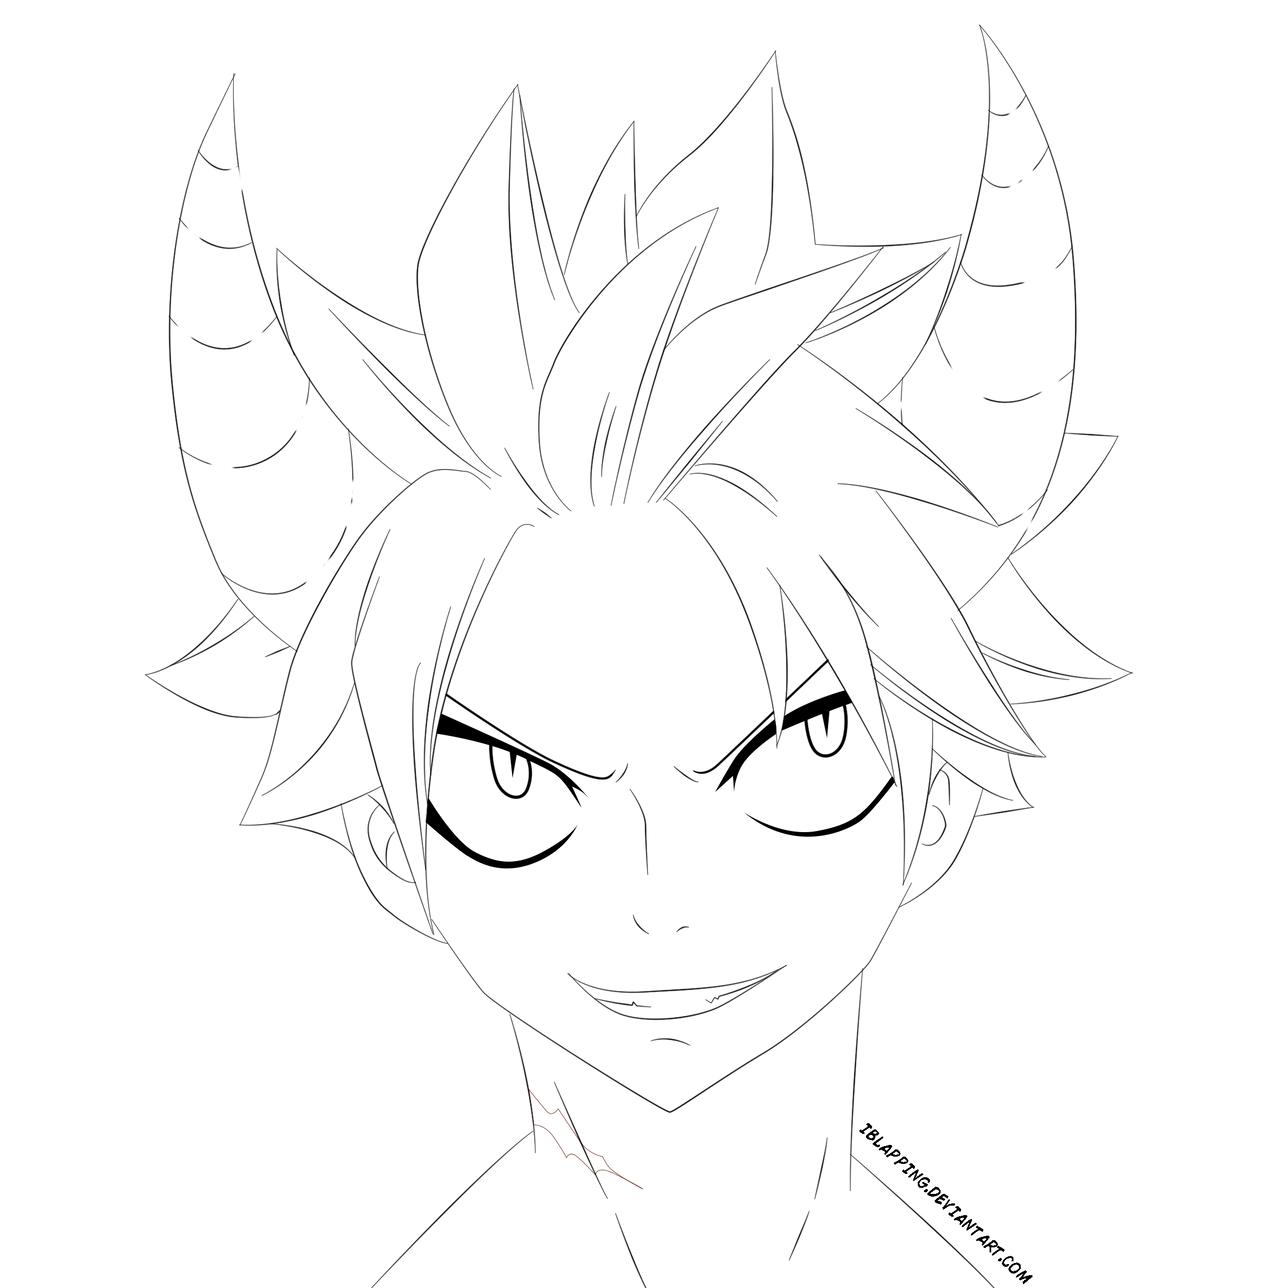 Natsu Lineart : Natsu e n d lineart by iblapping on deviantart